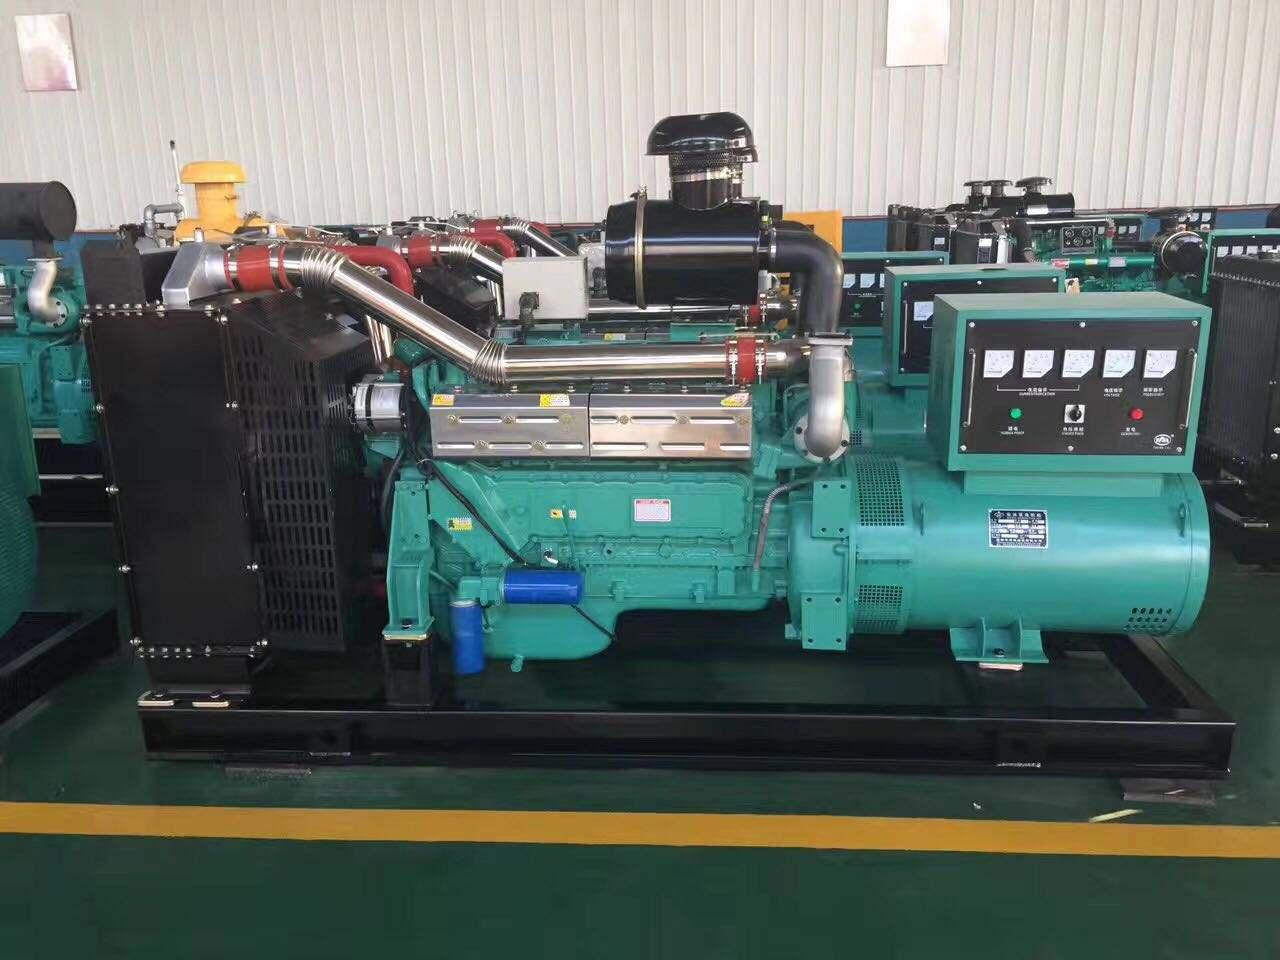 WP6D132E200潍柴柴油发电机组100KW|奔马动力潍柴系列柴油发电机组-潍坊奔马动力设备有限公司